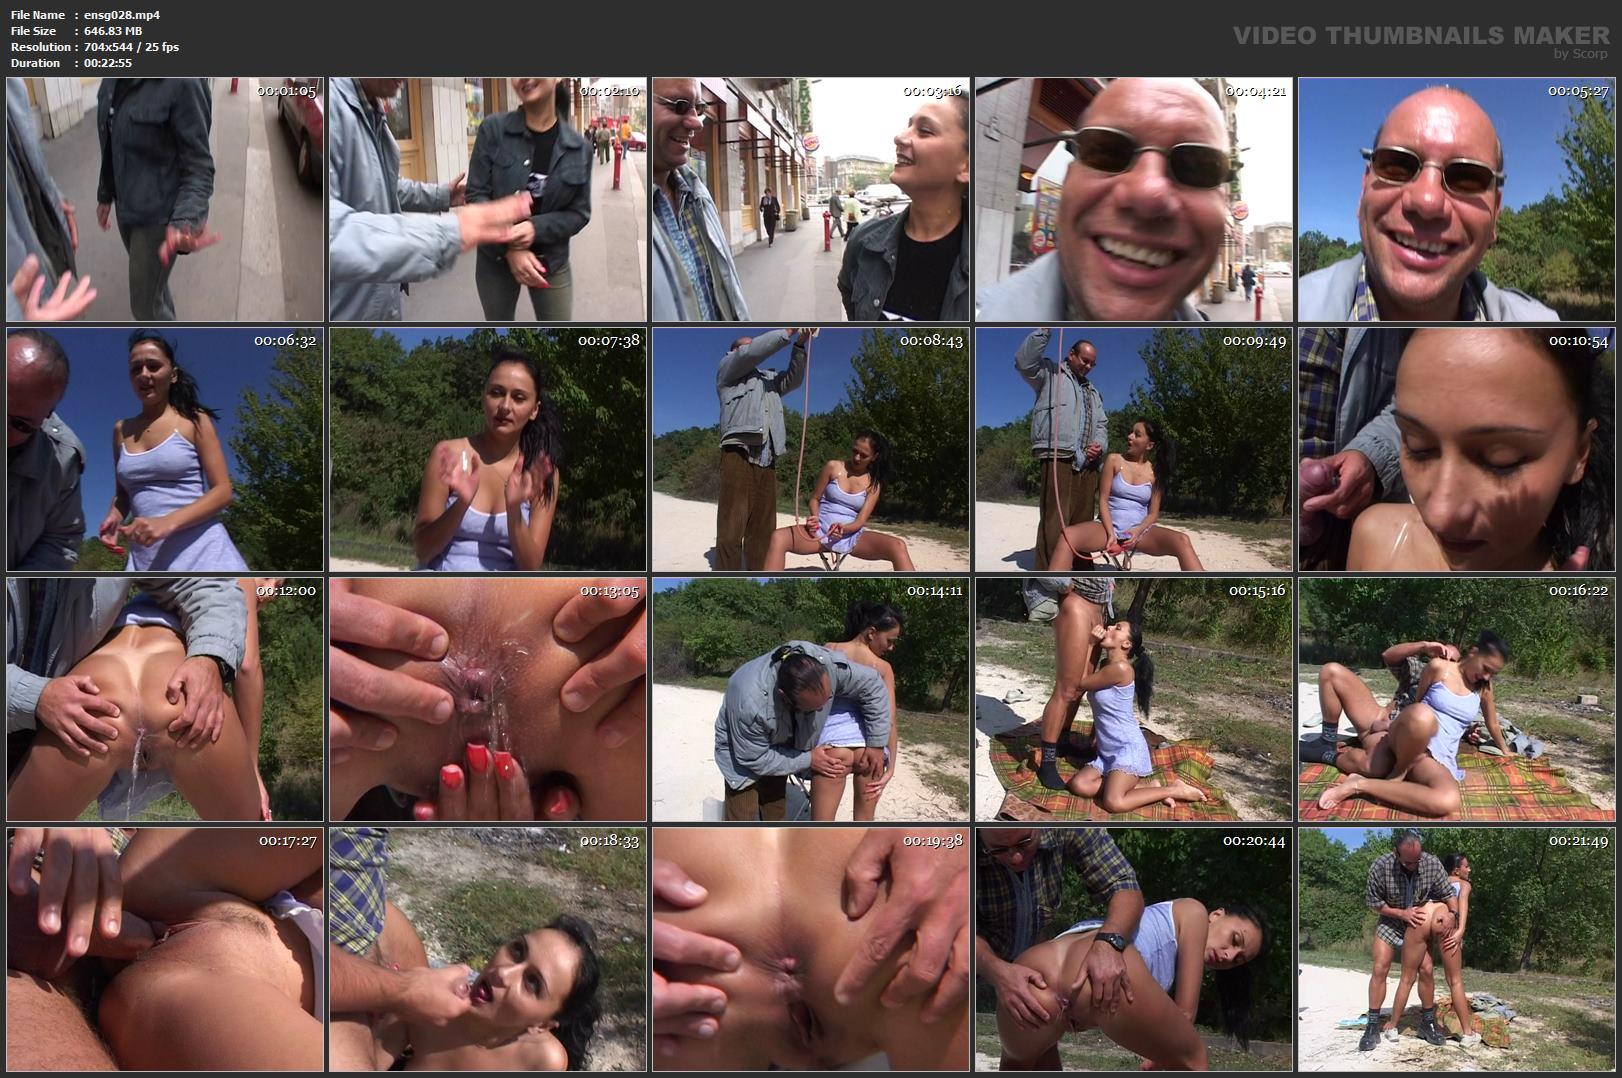 [ENEMA / SG-VIDEO] Street And Panty Klistier No.24 - Scene 2 [SD][544p][MP4]